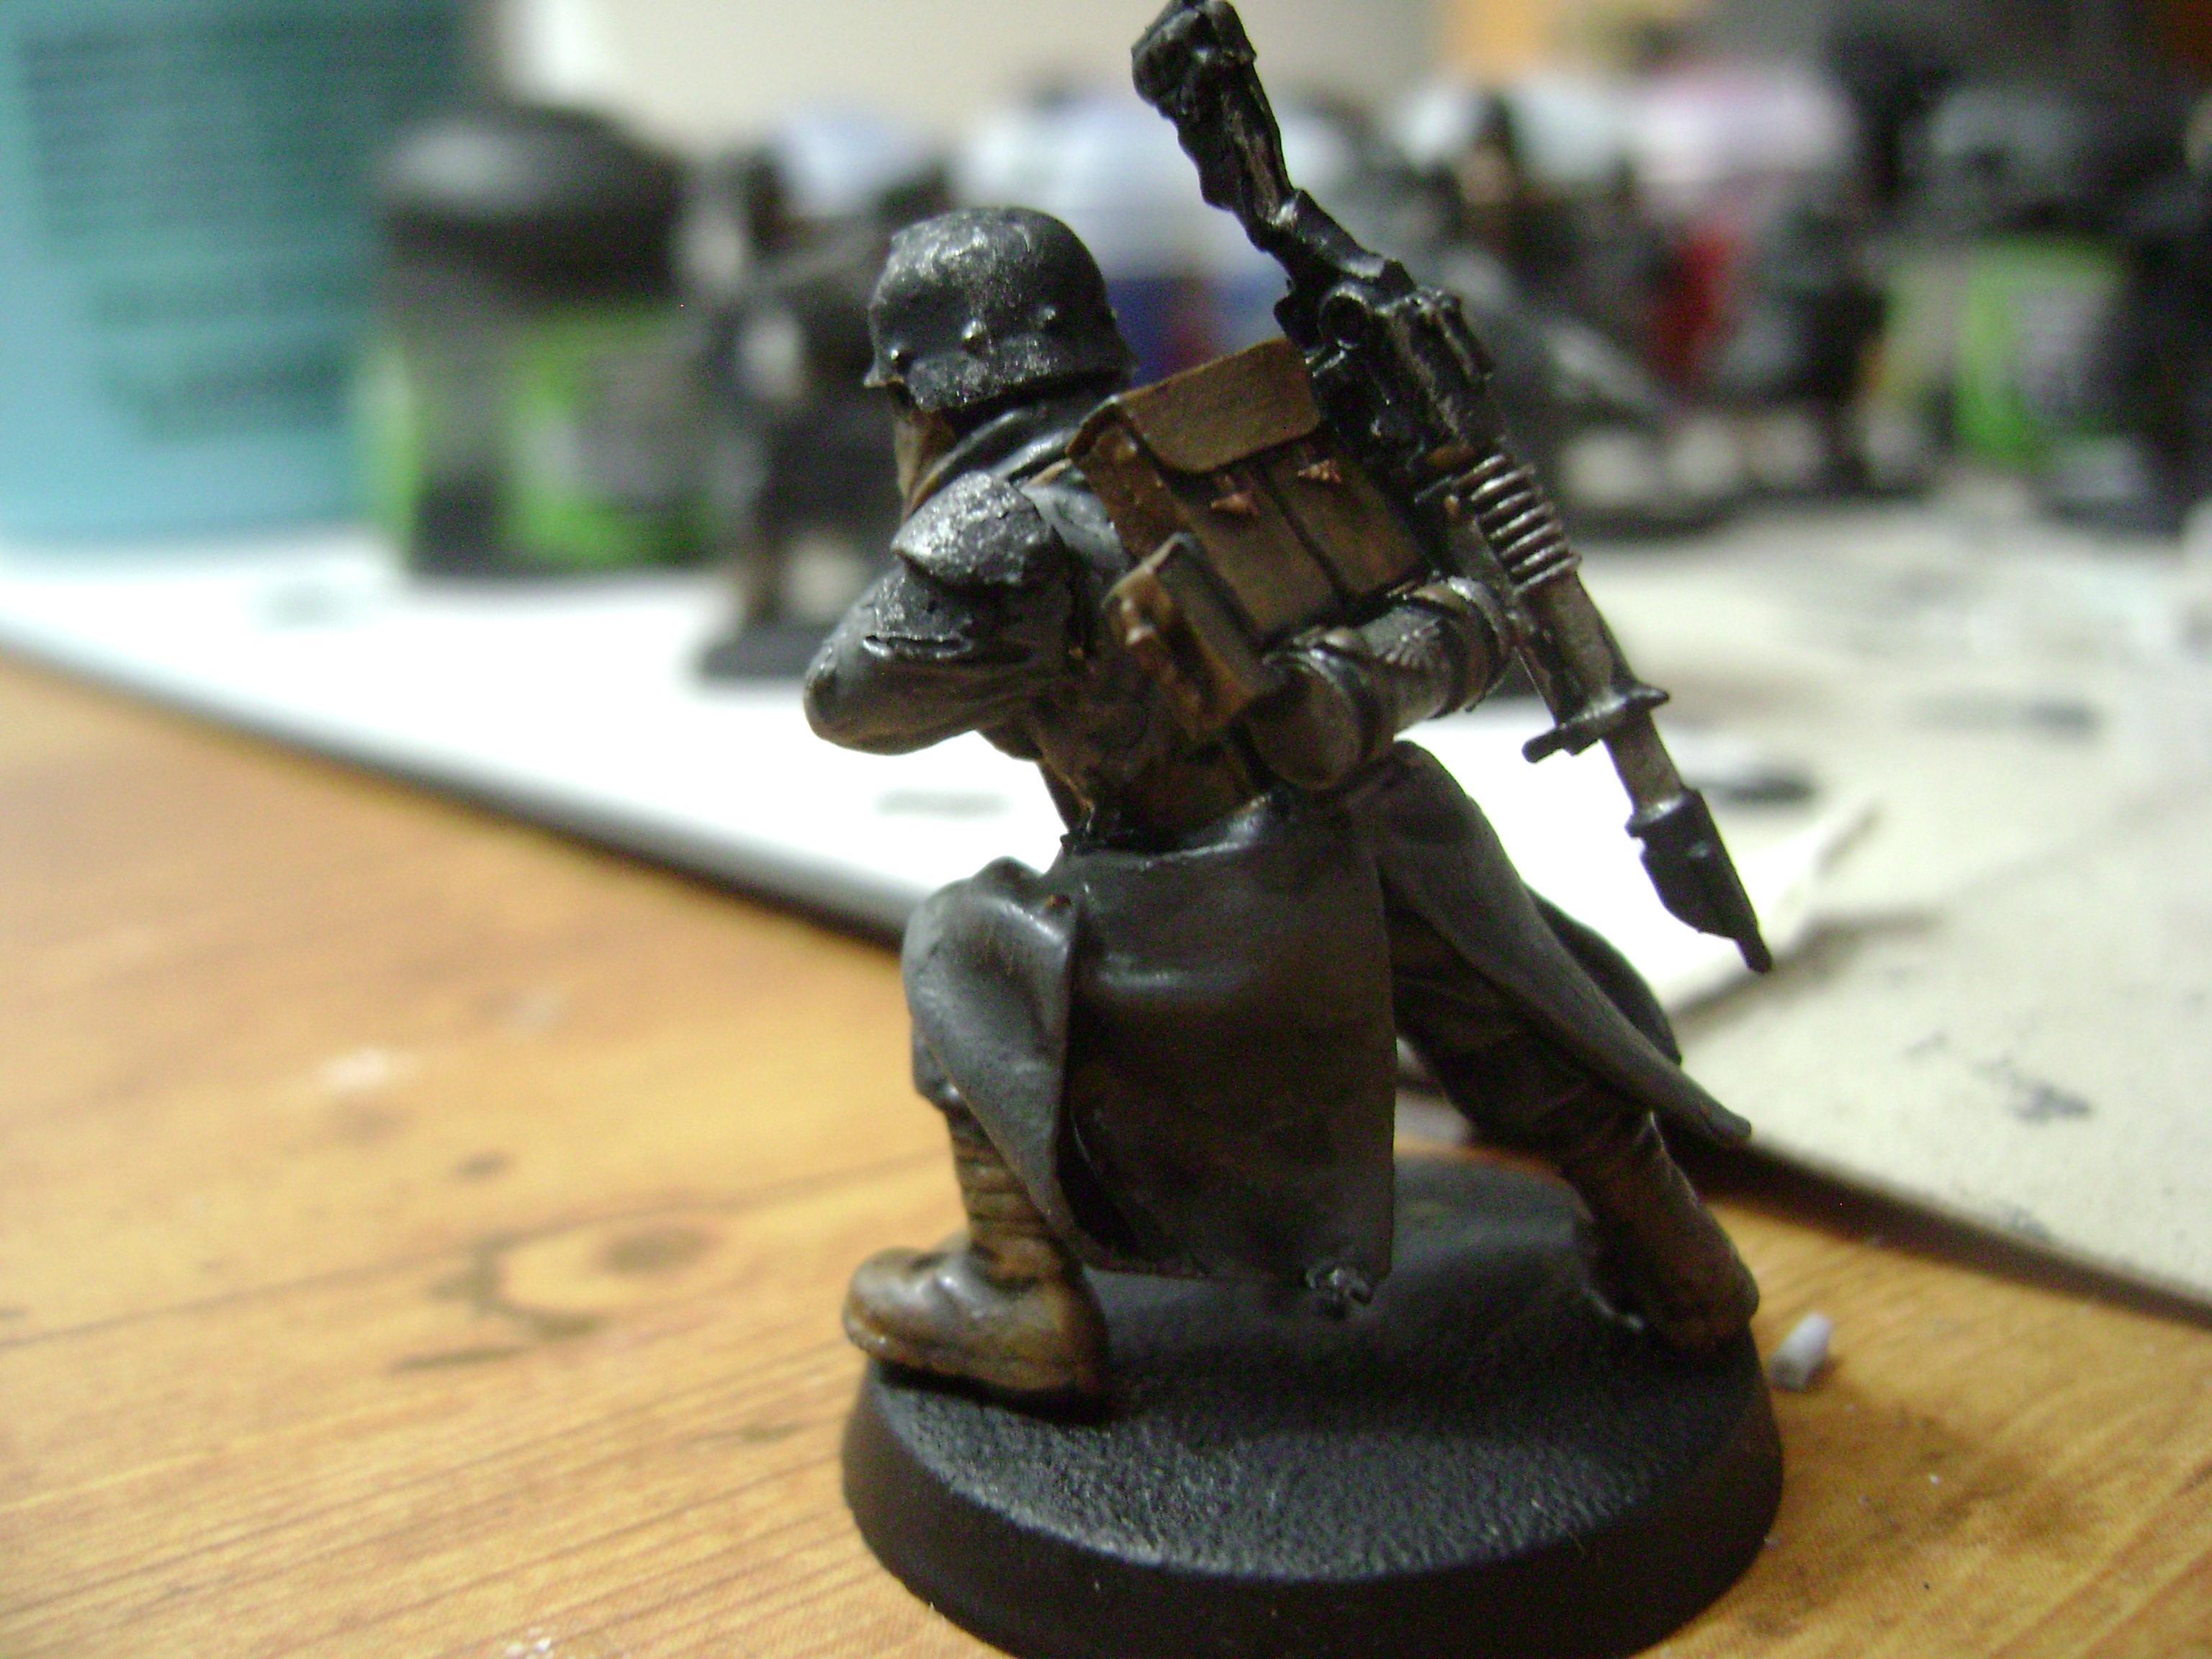 DK Grenade Side